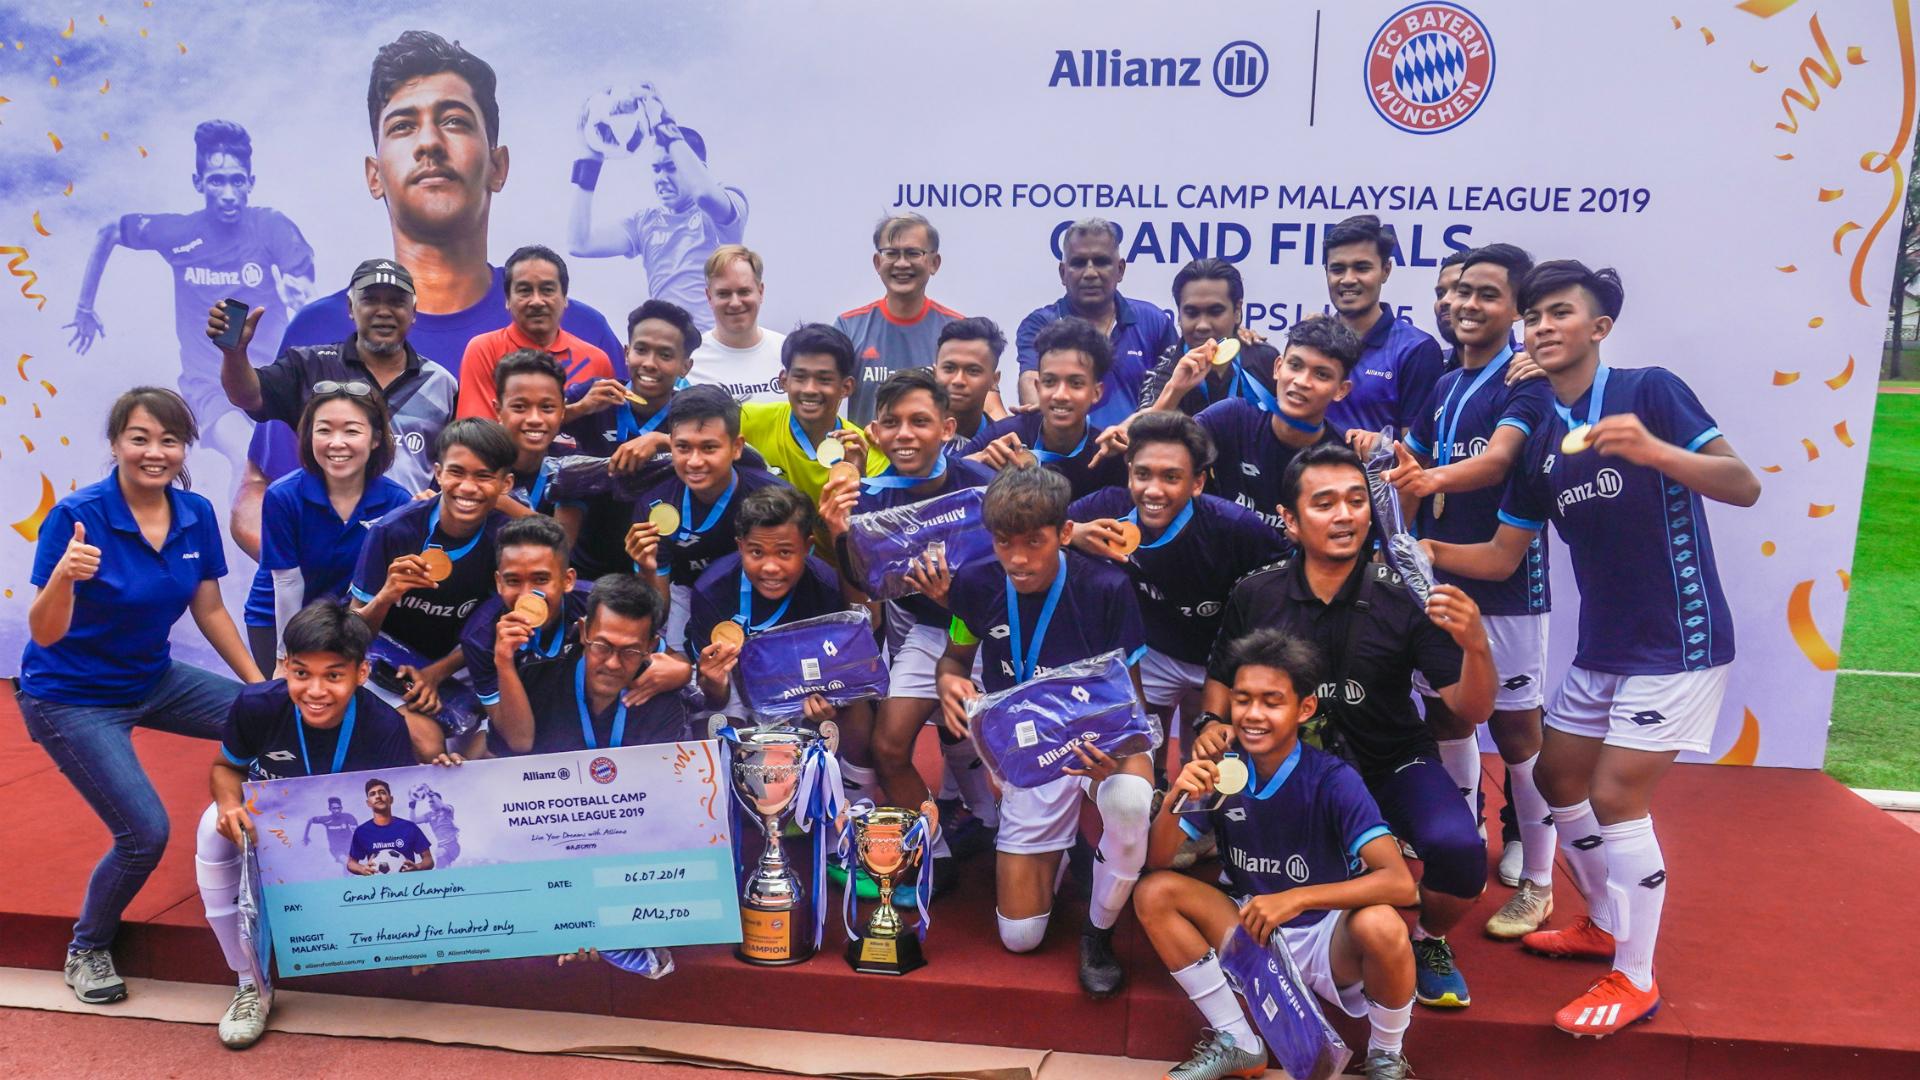 Allianz Junior Football Camp Malaysia 2019